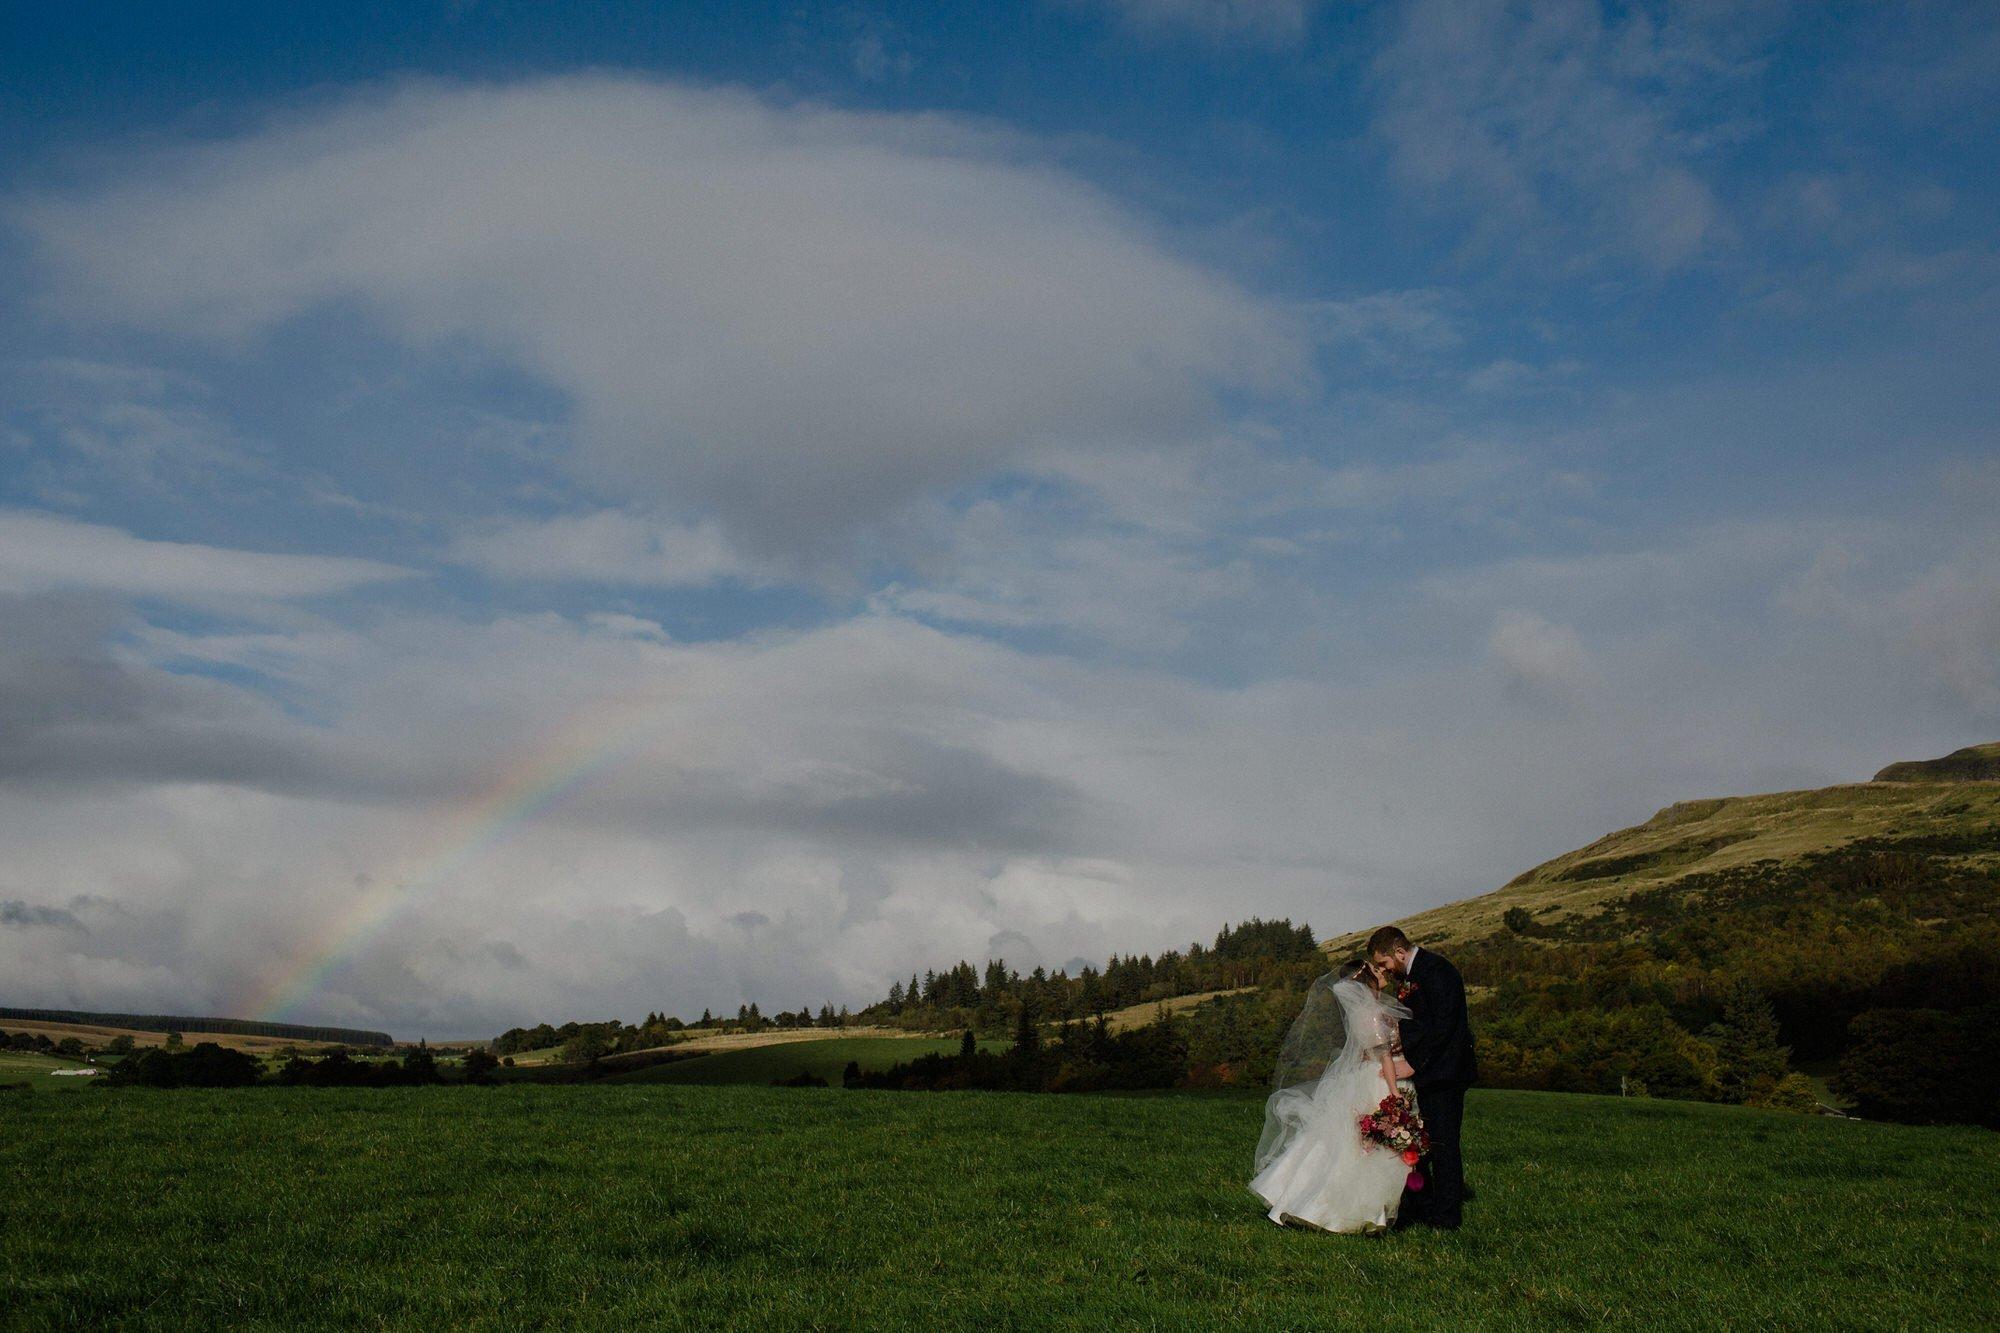 046 TIN SHED KNOCKRAICH FARM STIRLINGSHIRE WEDDING RAINBOW COUPLE ALTERNATIVE BRIDE ZOE ALEXANDRA PHOTOGRAPHY